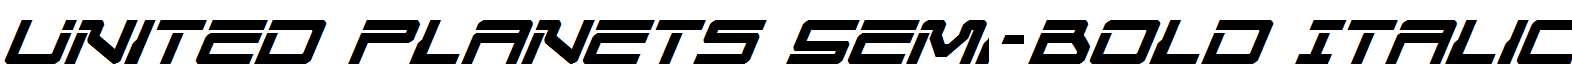 United-Planets-Semi-Bold-Italic